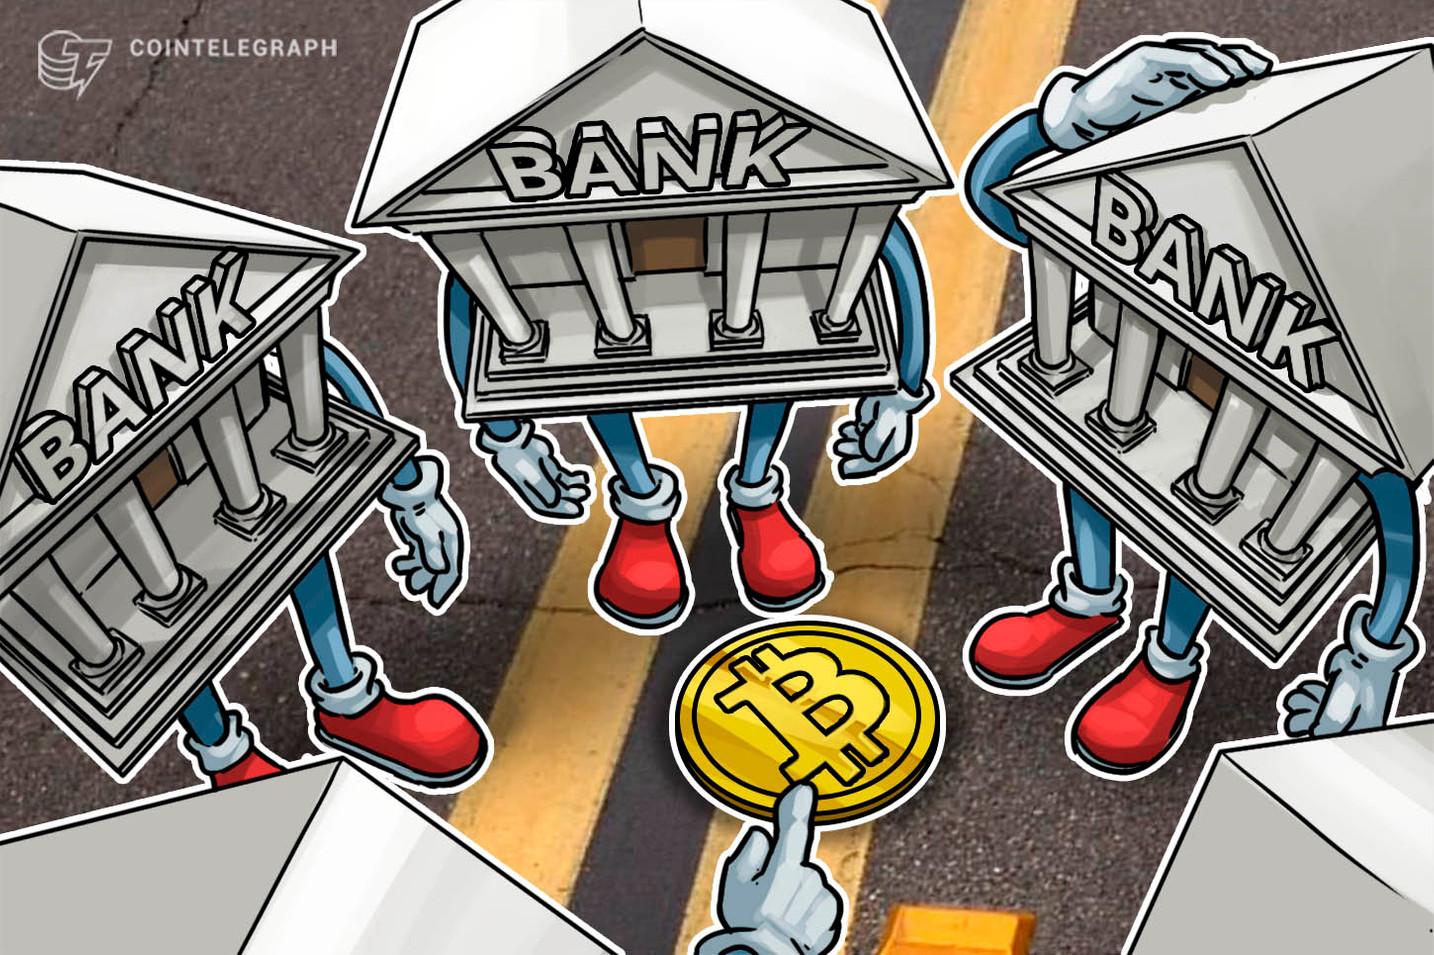 Circle solicita licencia bancaria, registro de lugar de negociación para expandir servicios de criptomonedas